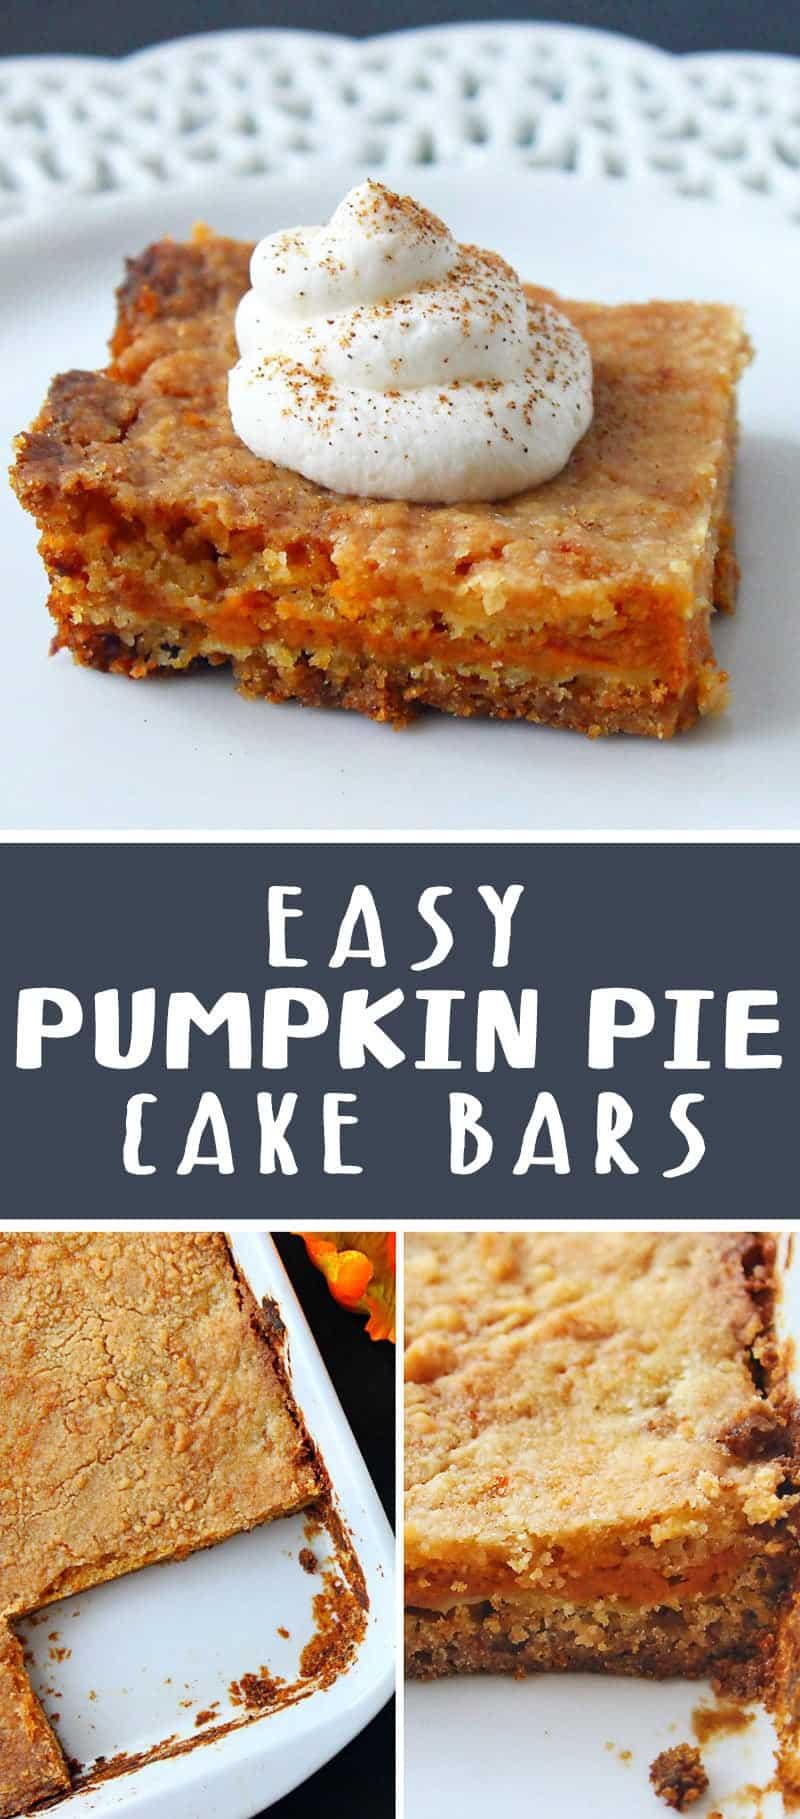 Easy Pumpkin Pie Cake Bars